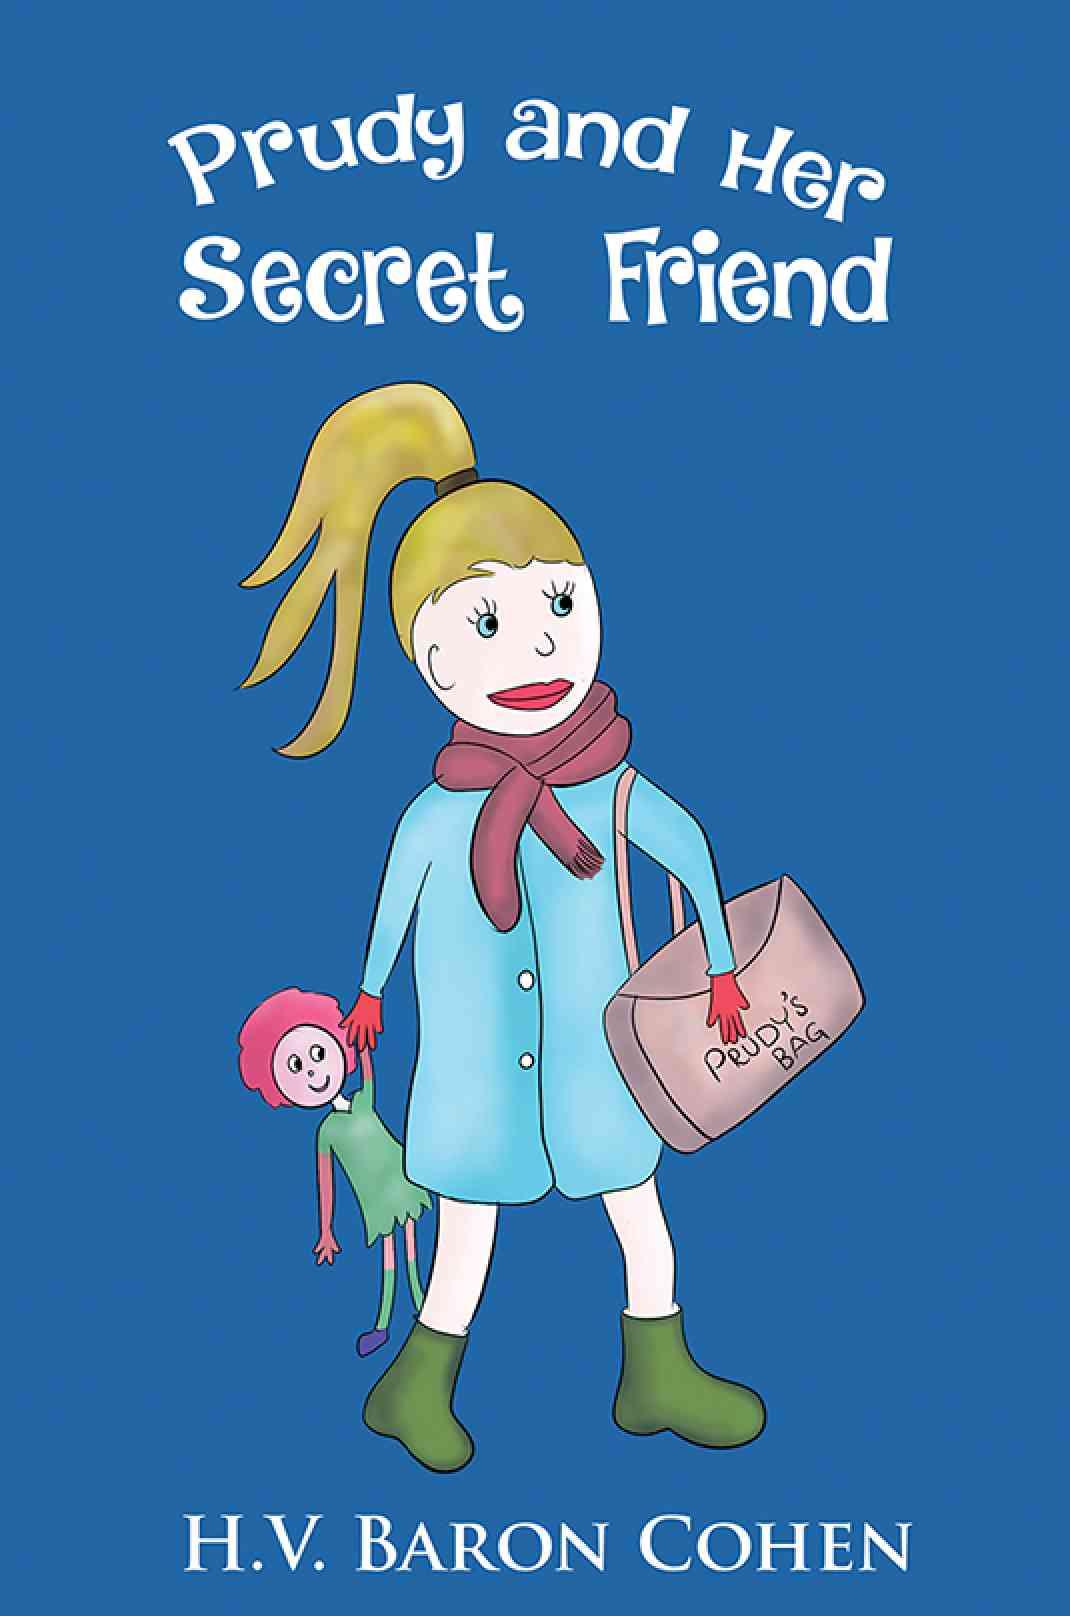 Prudy and Her Secret Friend